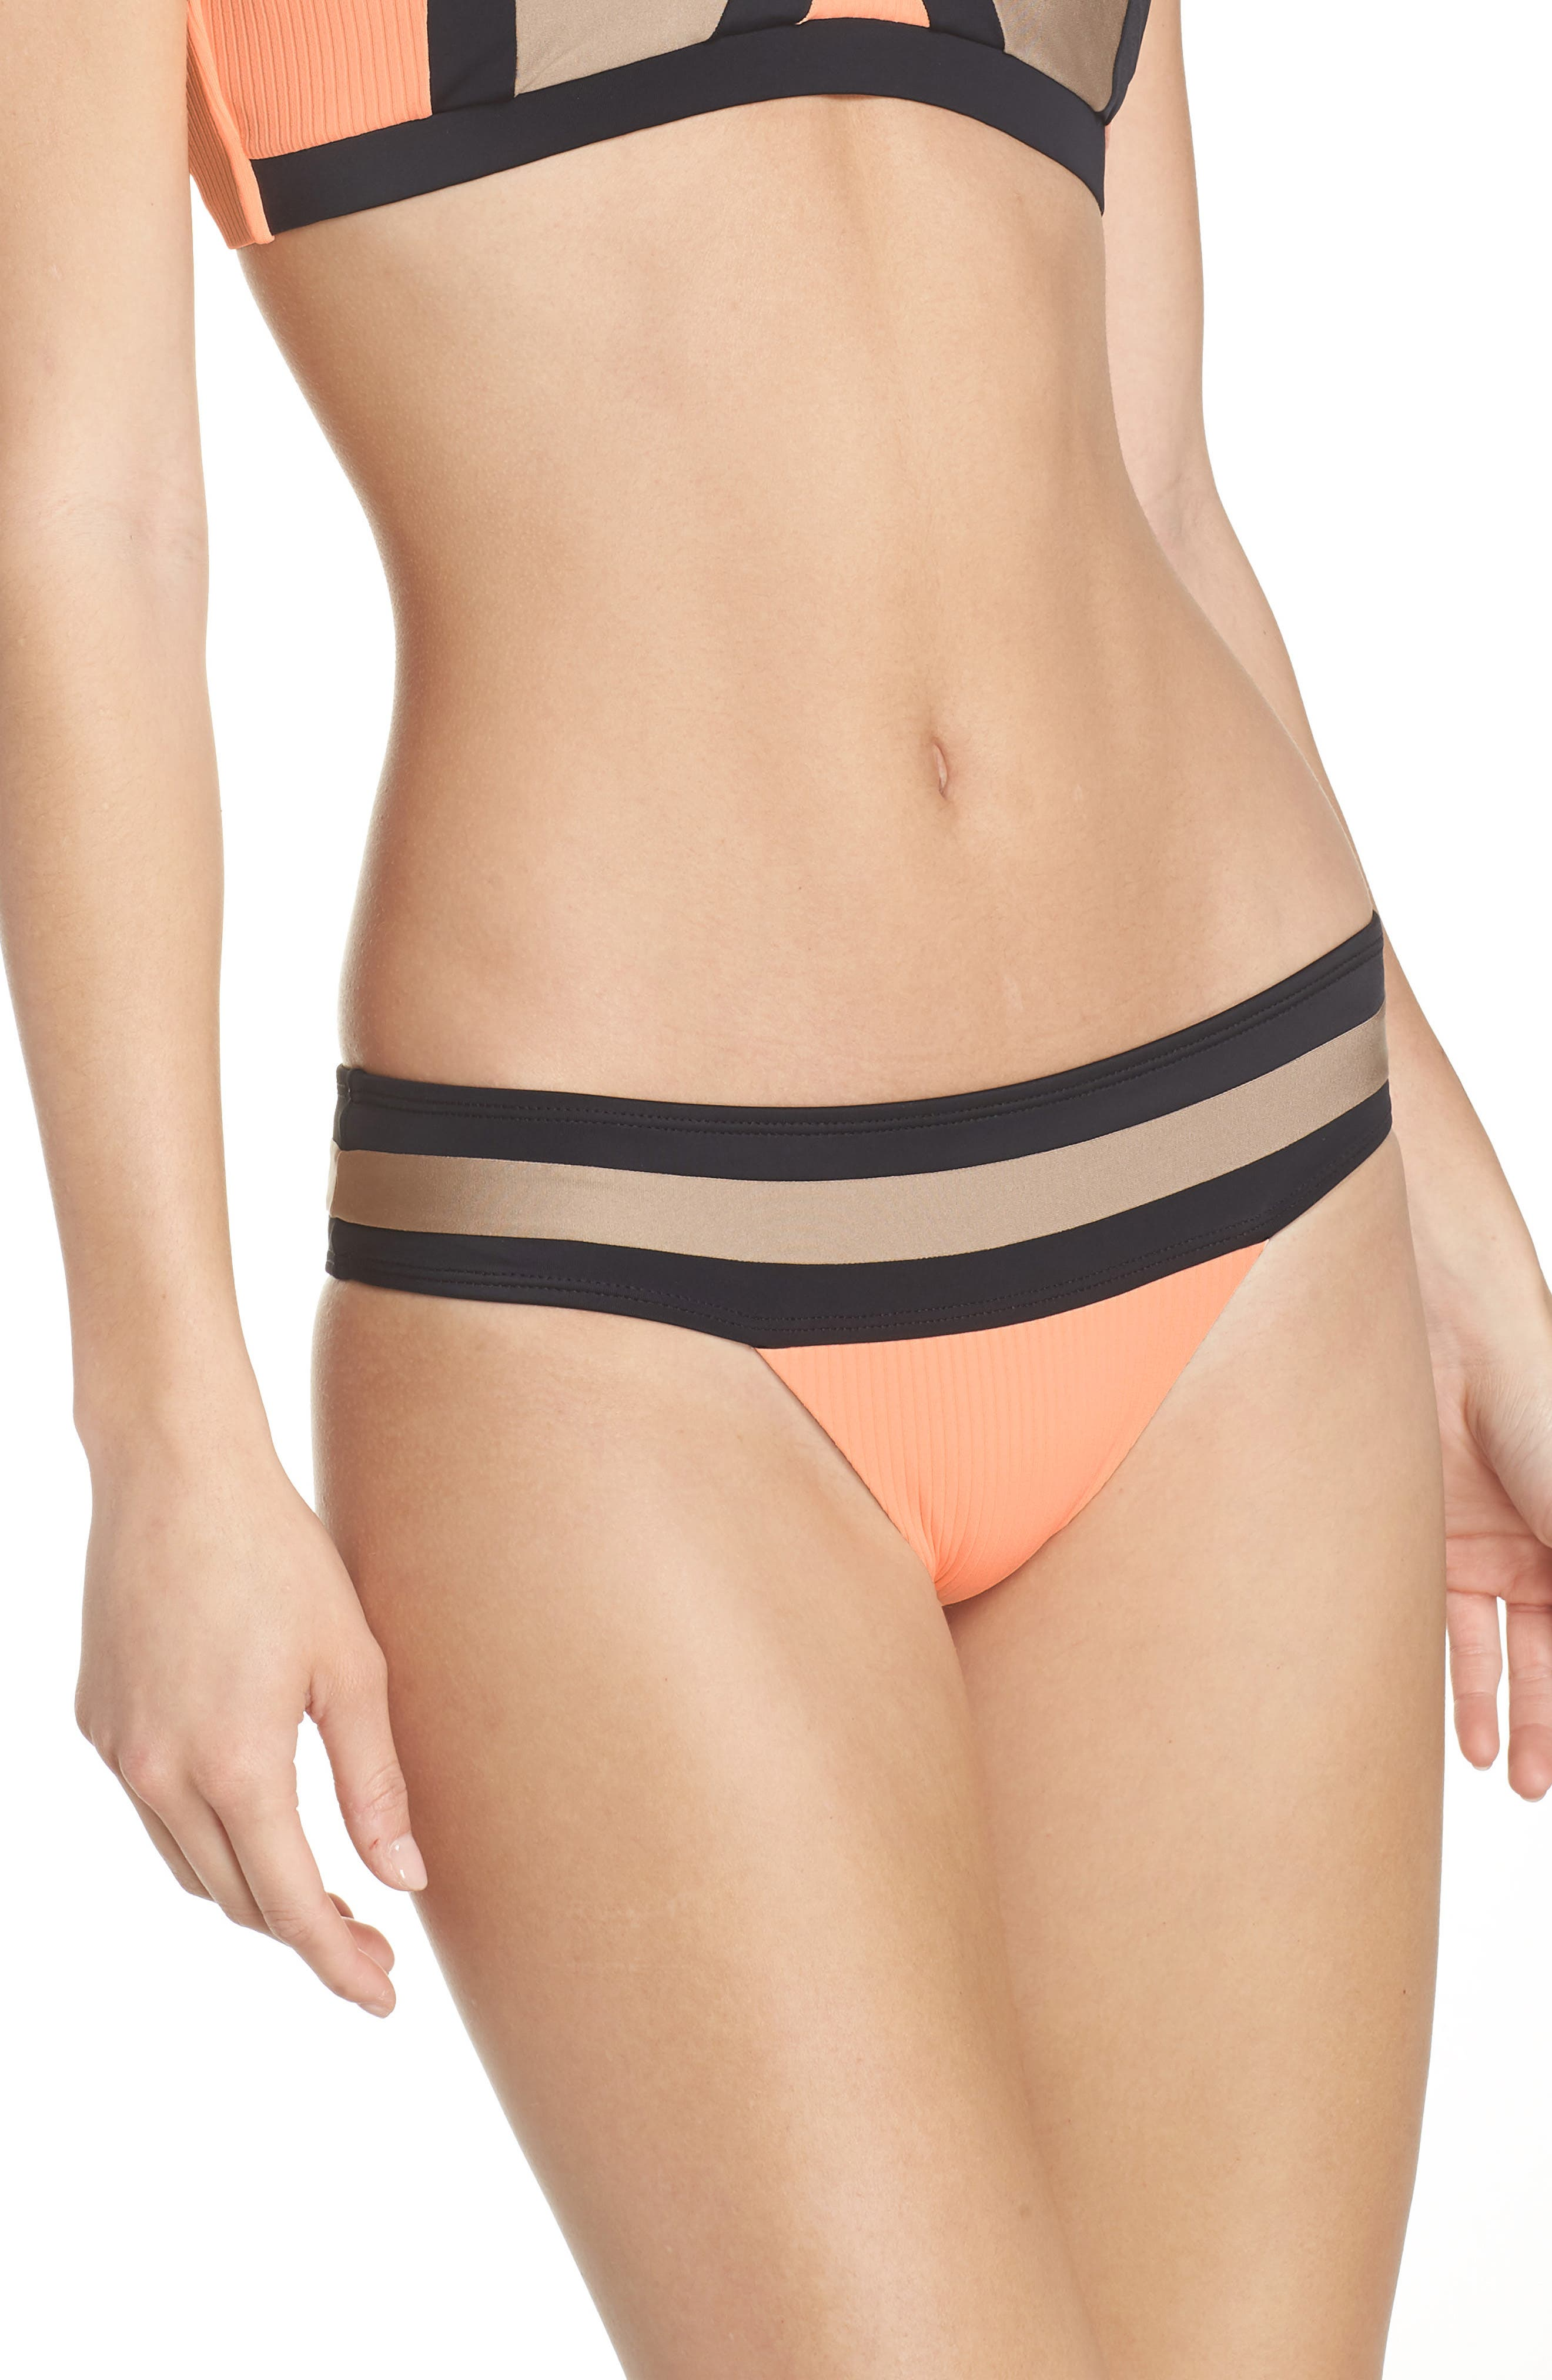 Banded Bikini Bottoms,                             Main thumbnail 1, color,                             Sandstone